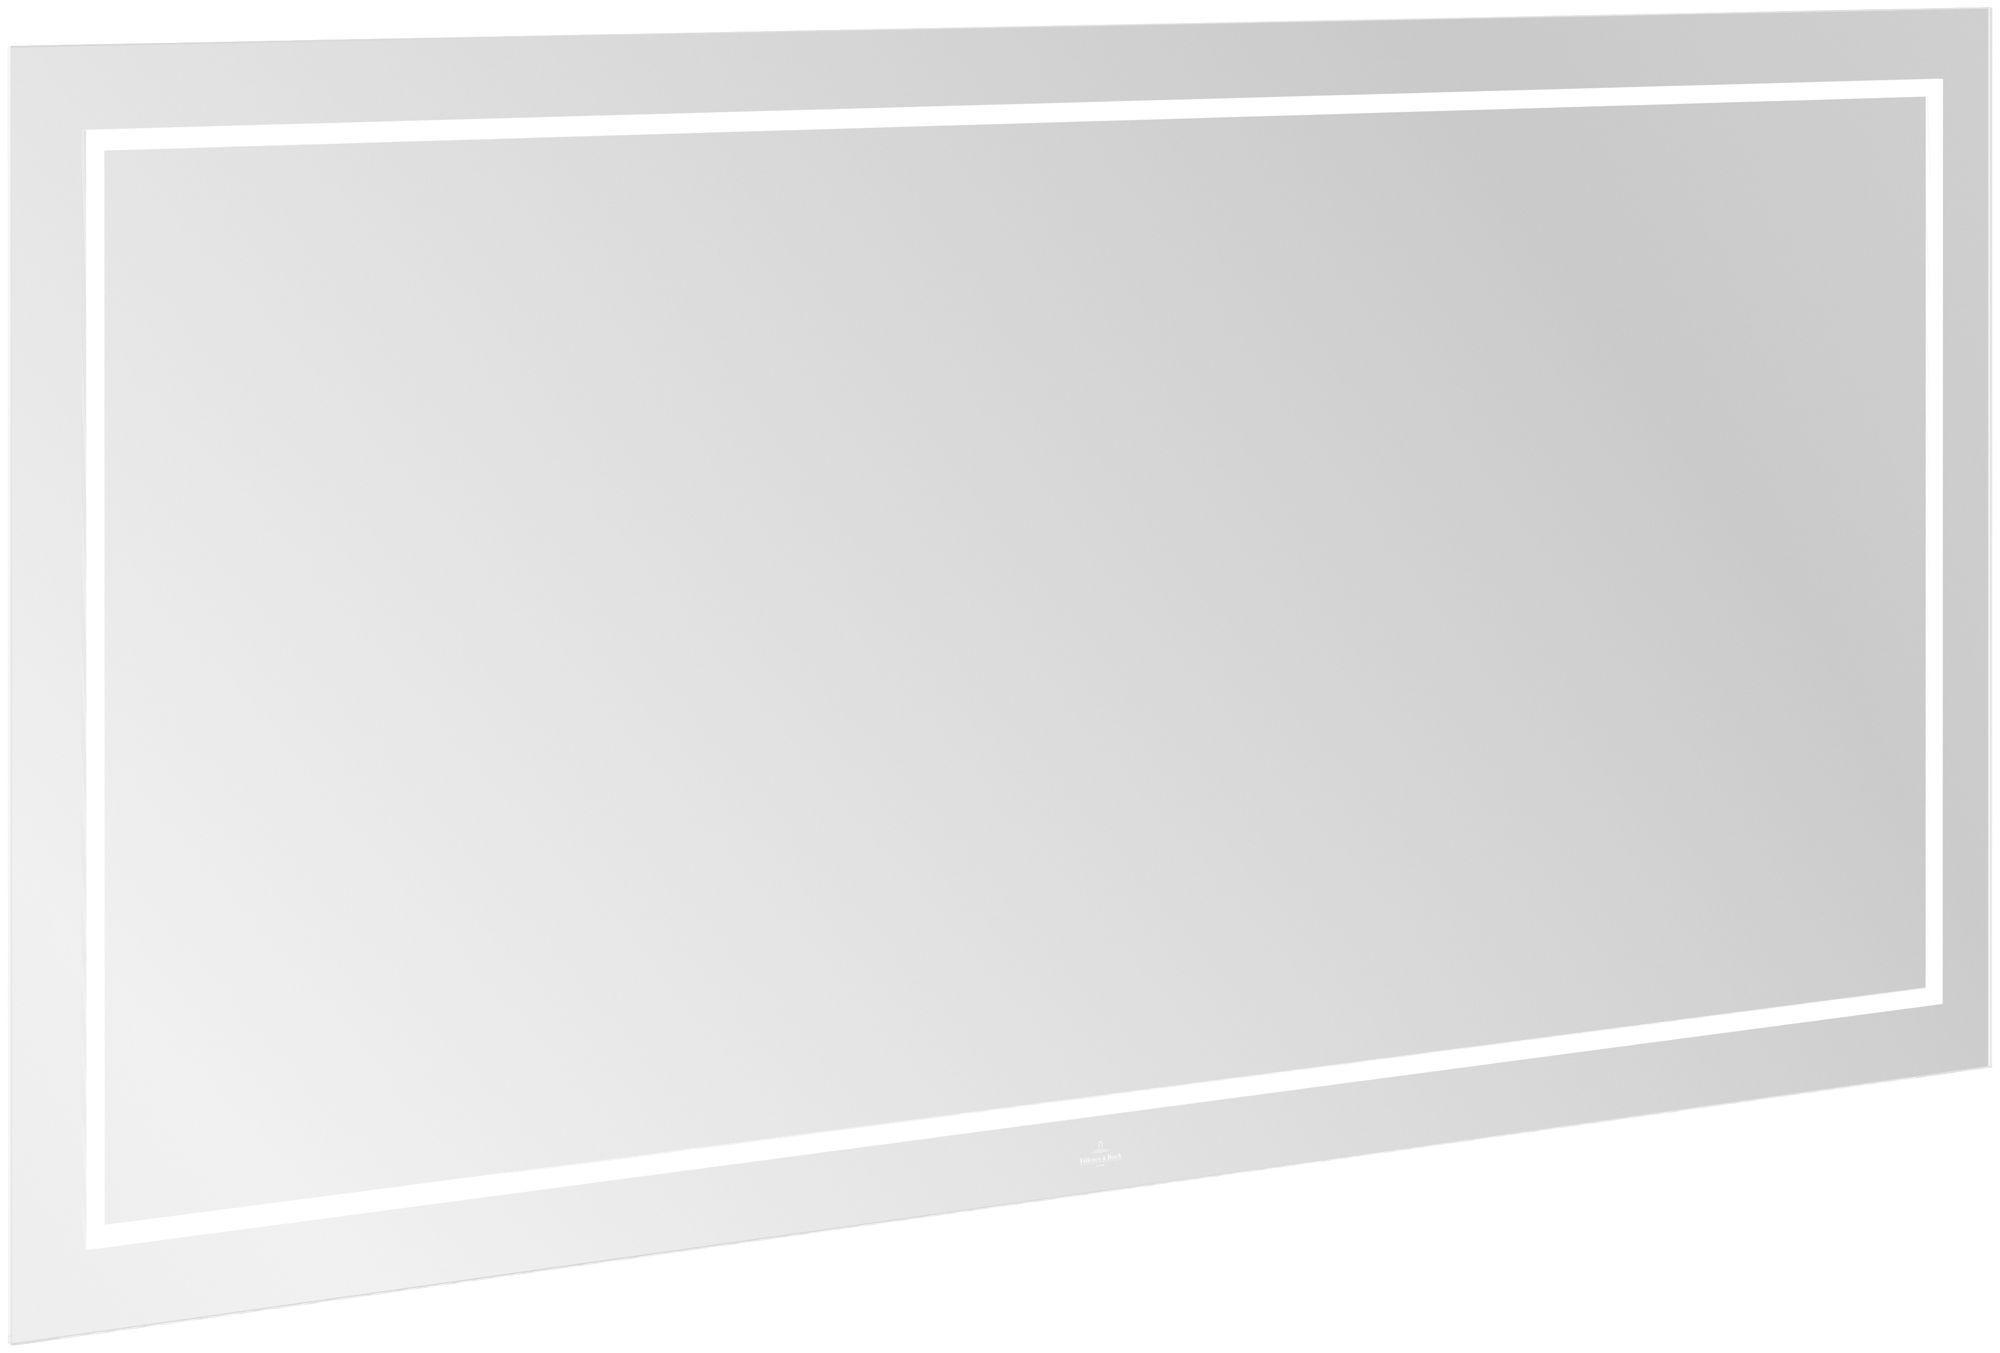 Villeroy & Boch Finion G600 Spiegel LED-Beleuchtung B:160xH:75xT:4,5cm G6001600